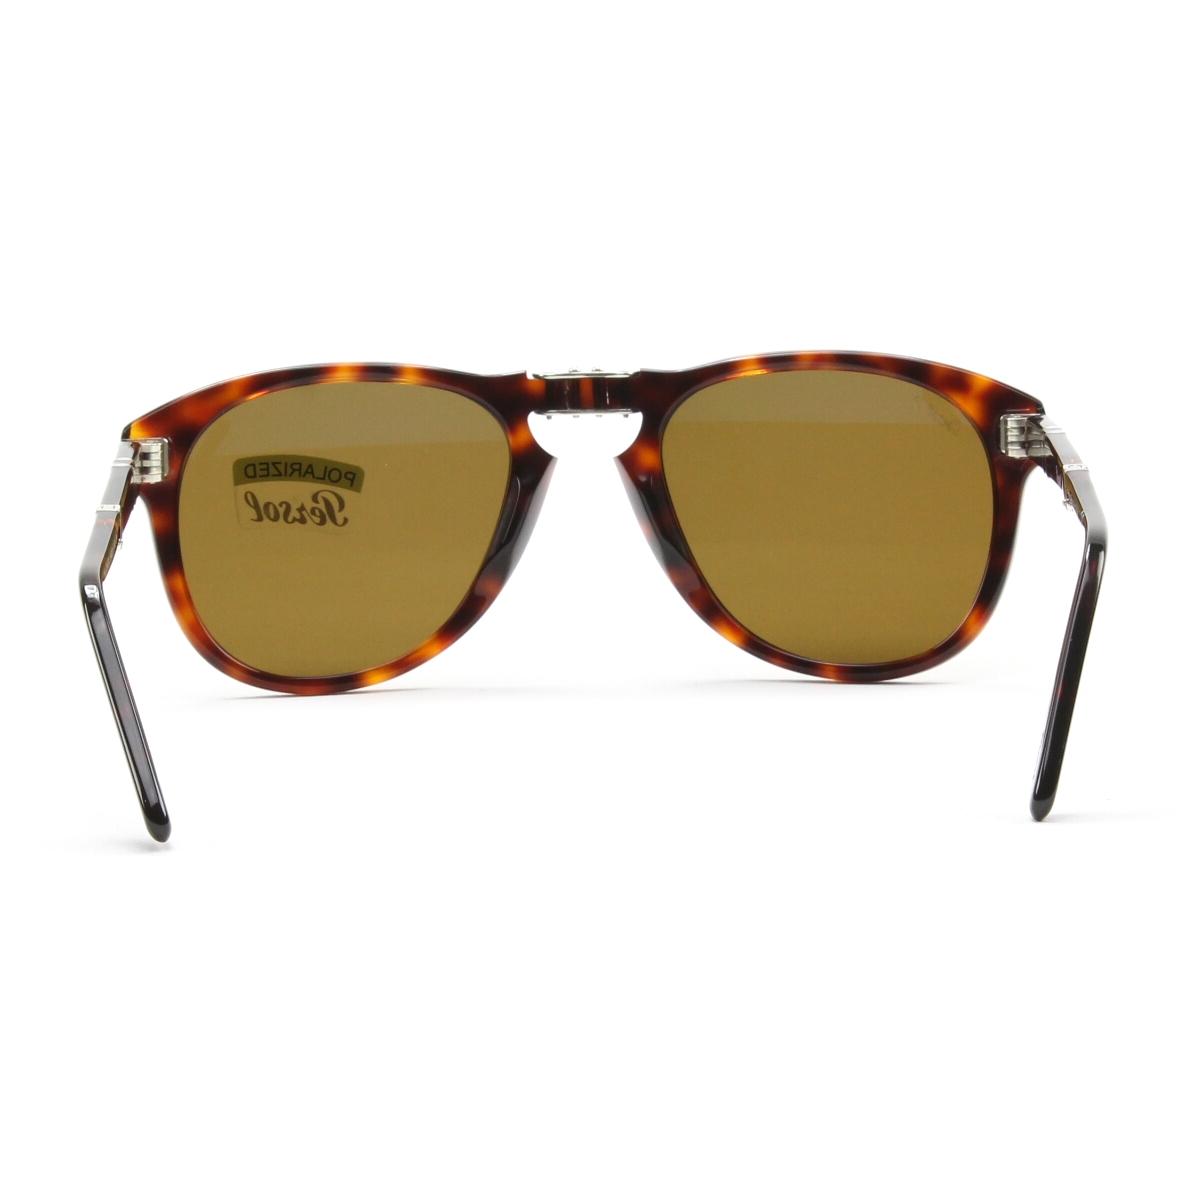 Persol 714 Folding Sunglasses 24/57 Havana, Brown Polarized Crystal Lenses 54mm | eBay